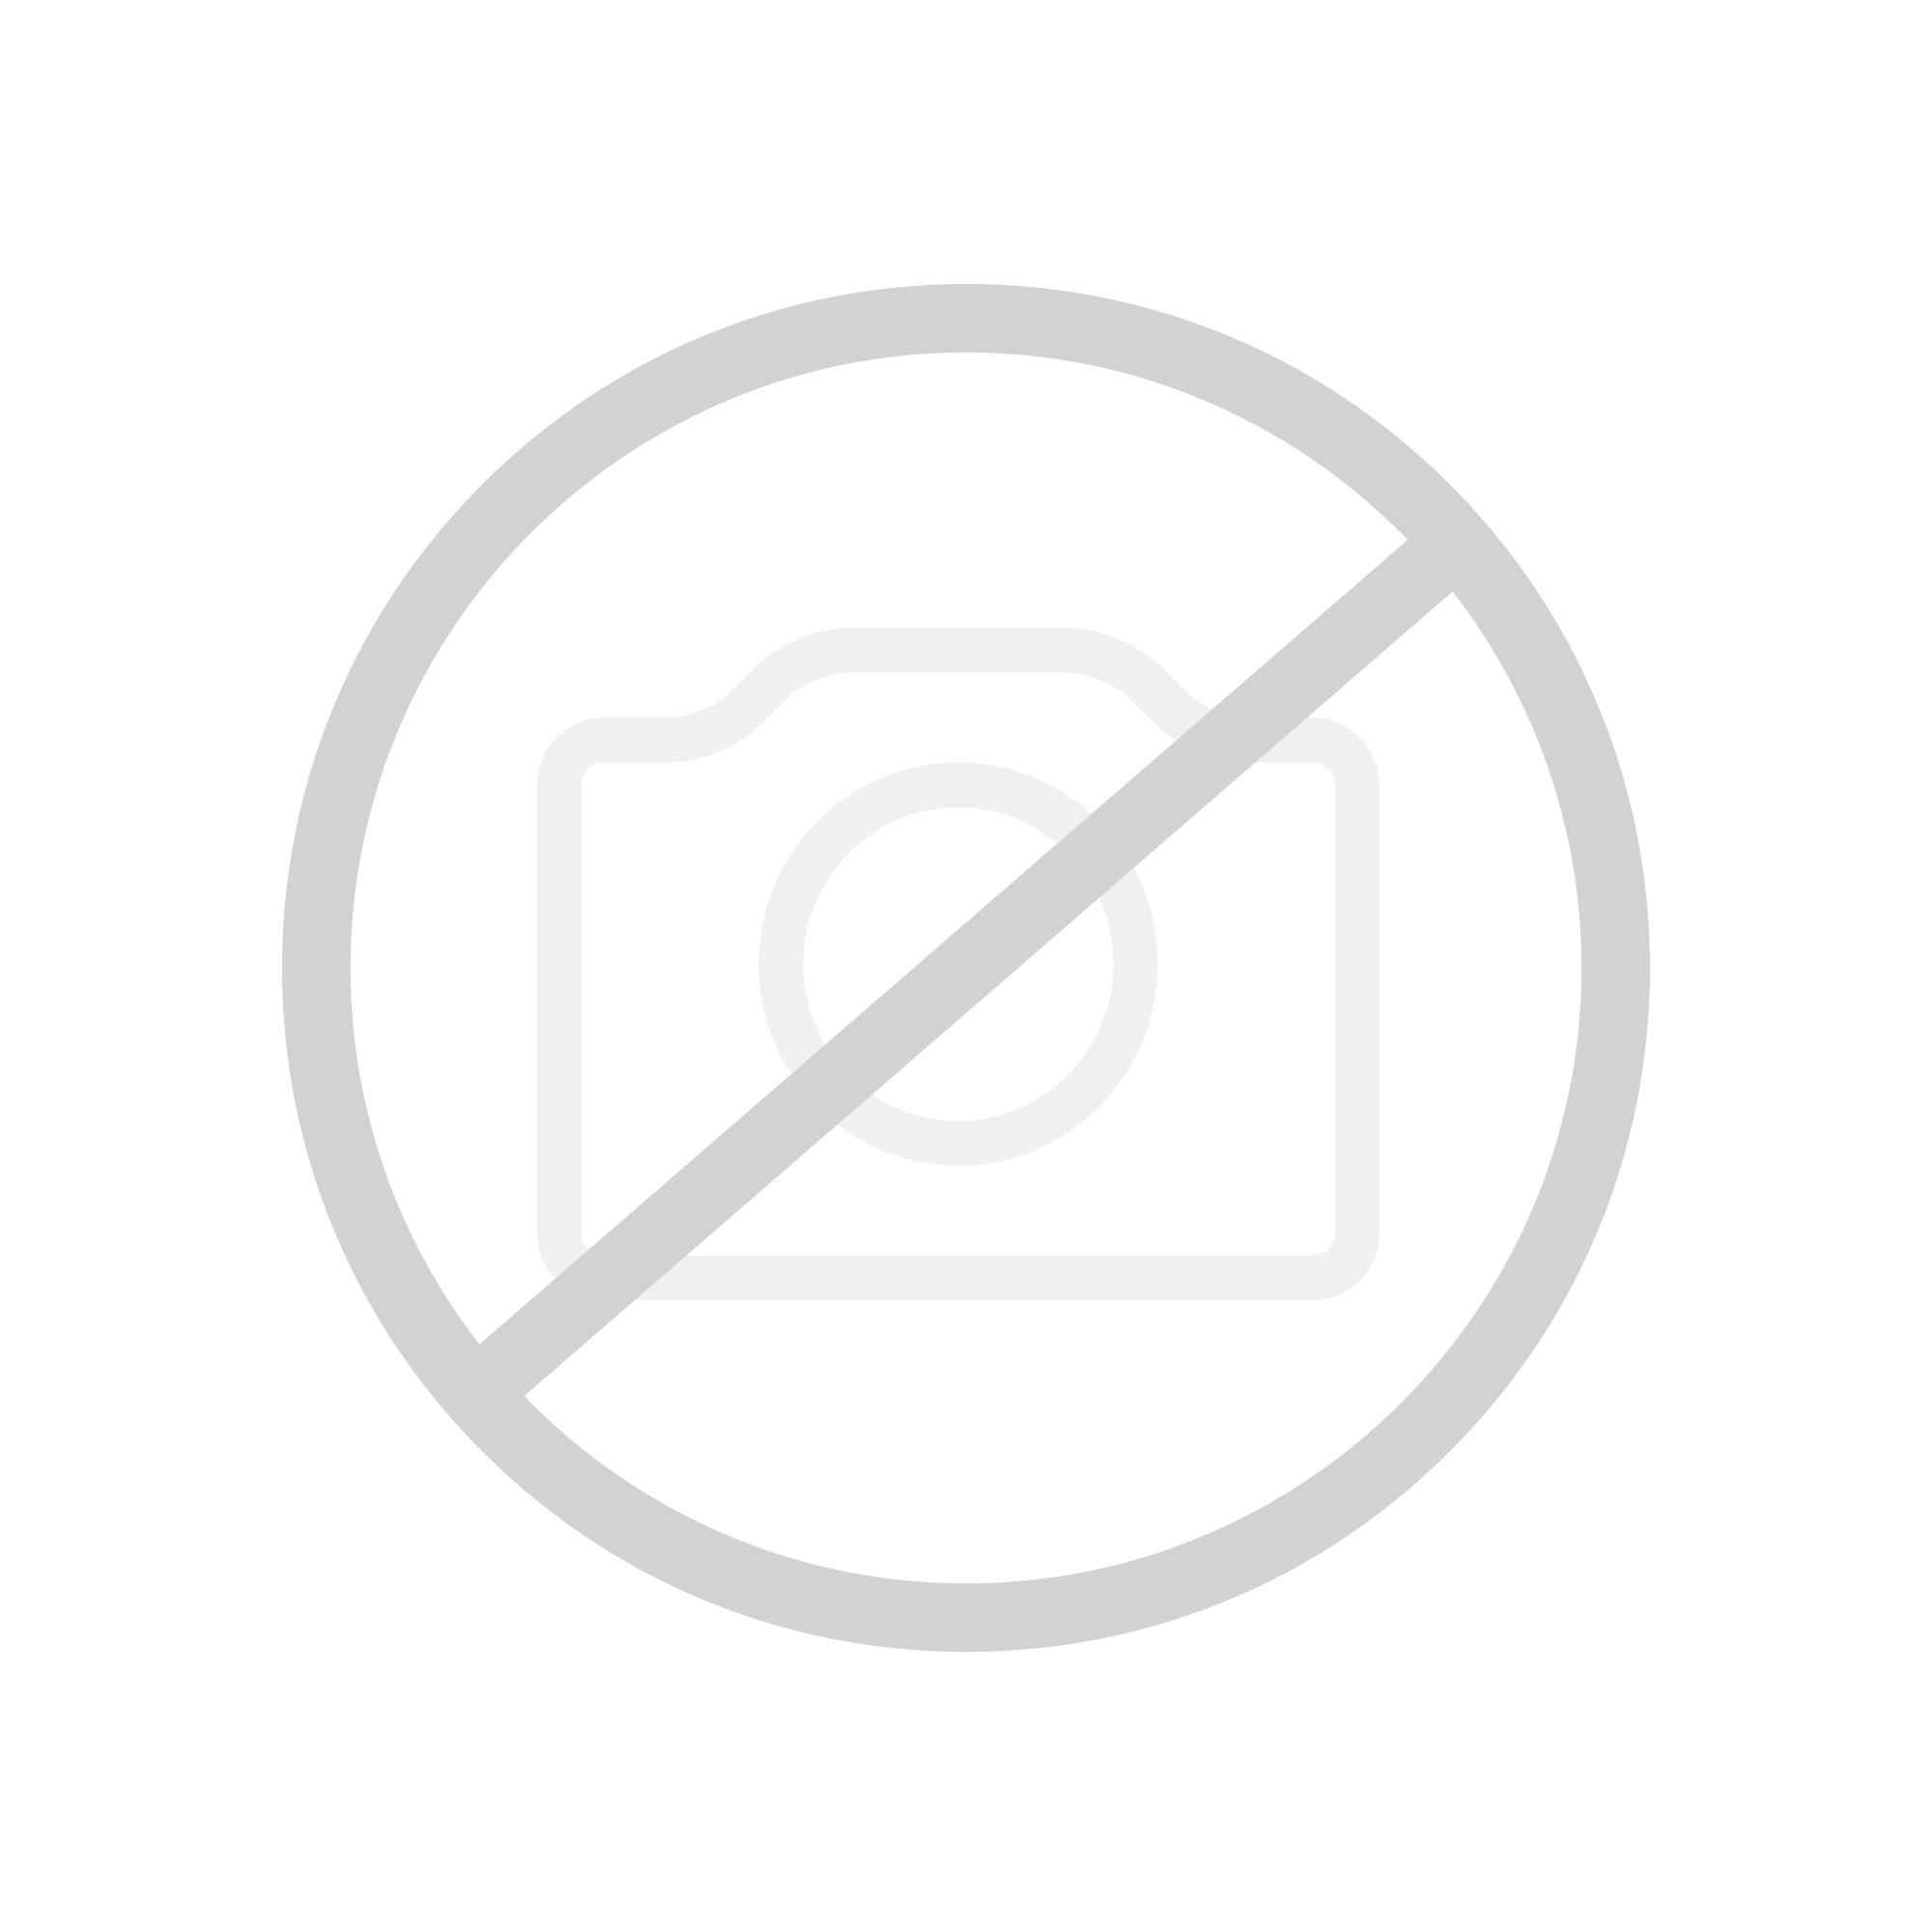 kaldewei centro duo oval badewanne m verkleidung pergamon perl effekt 282748053231 reuter. Black Bedroom Furniture Sets. Home Design Ideas